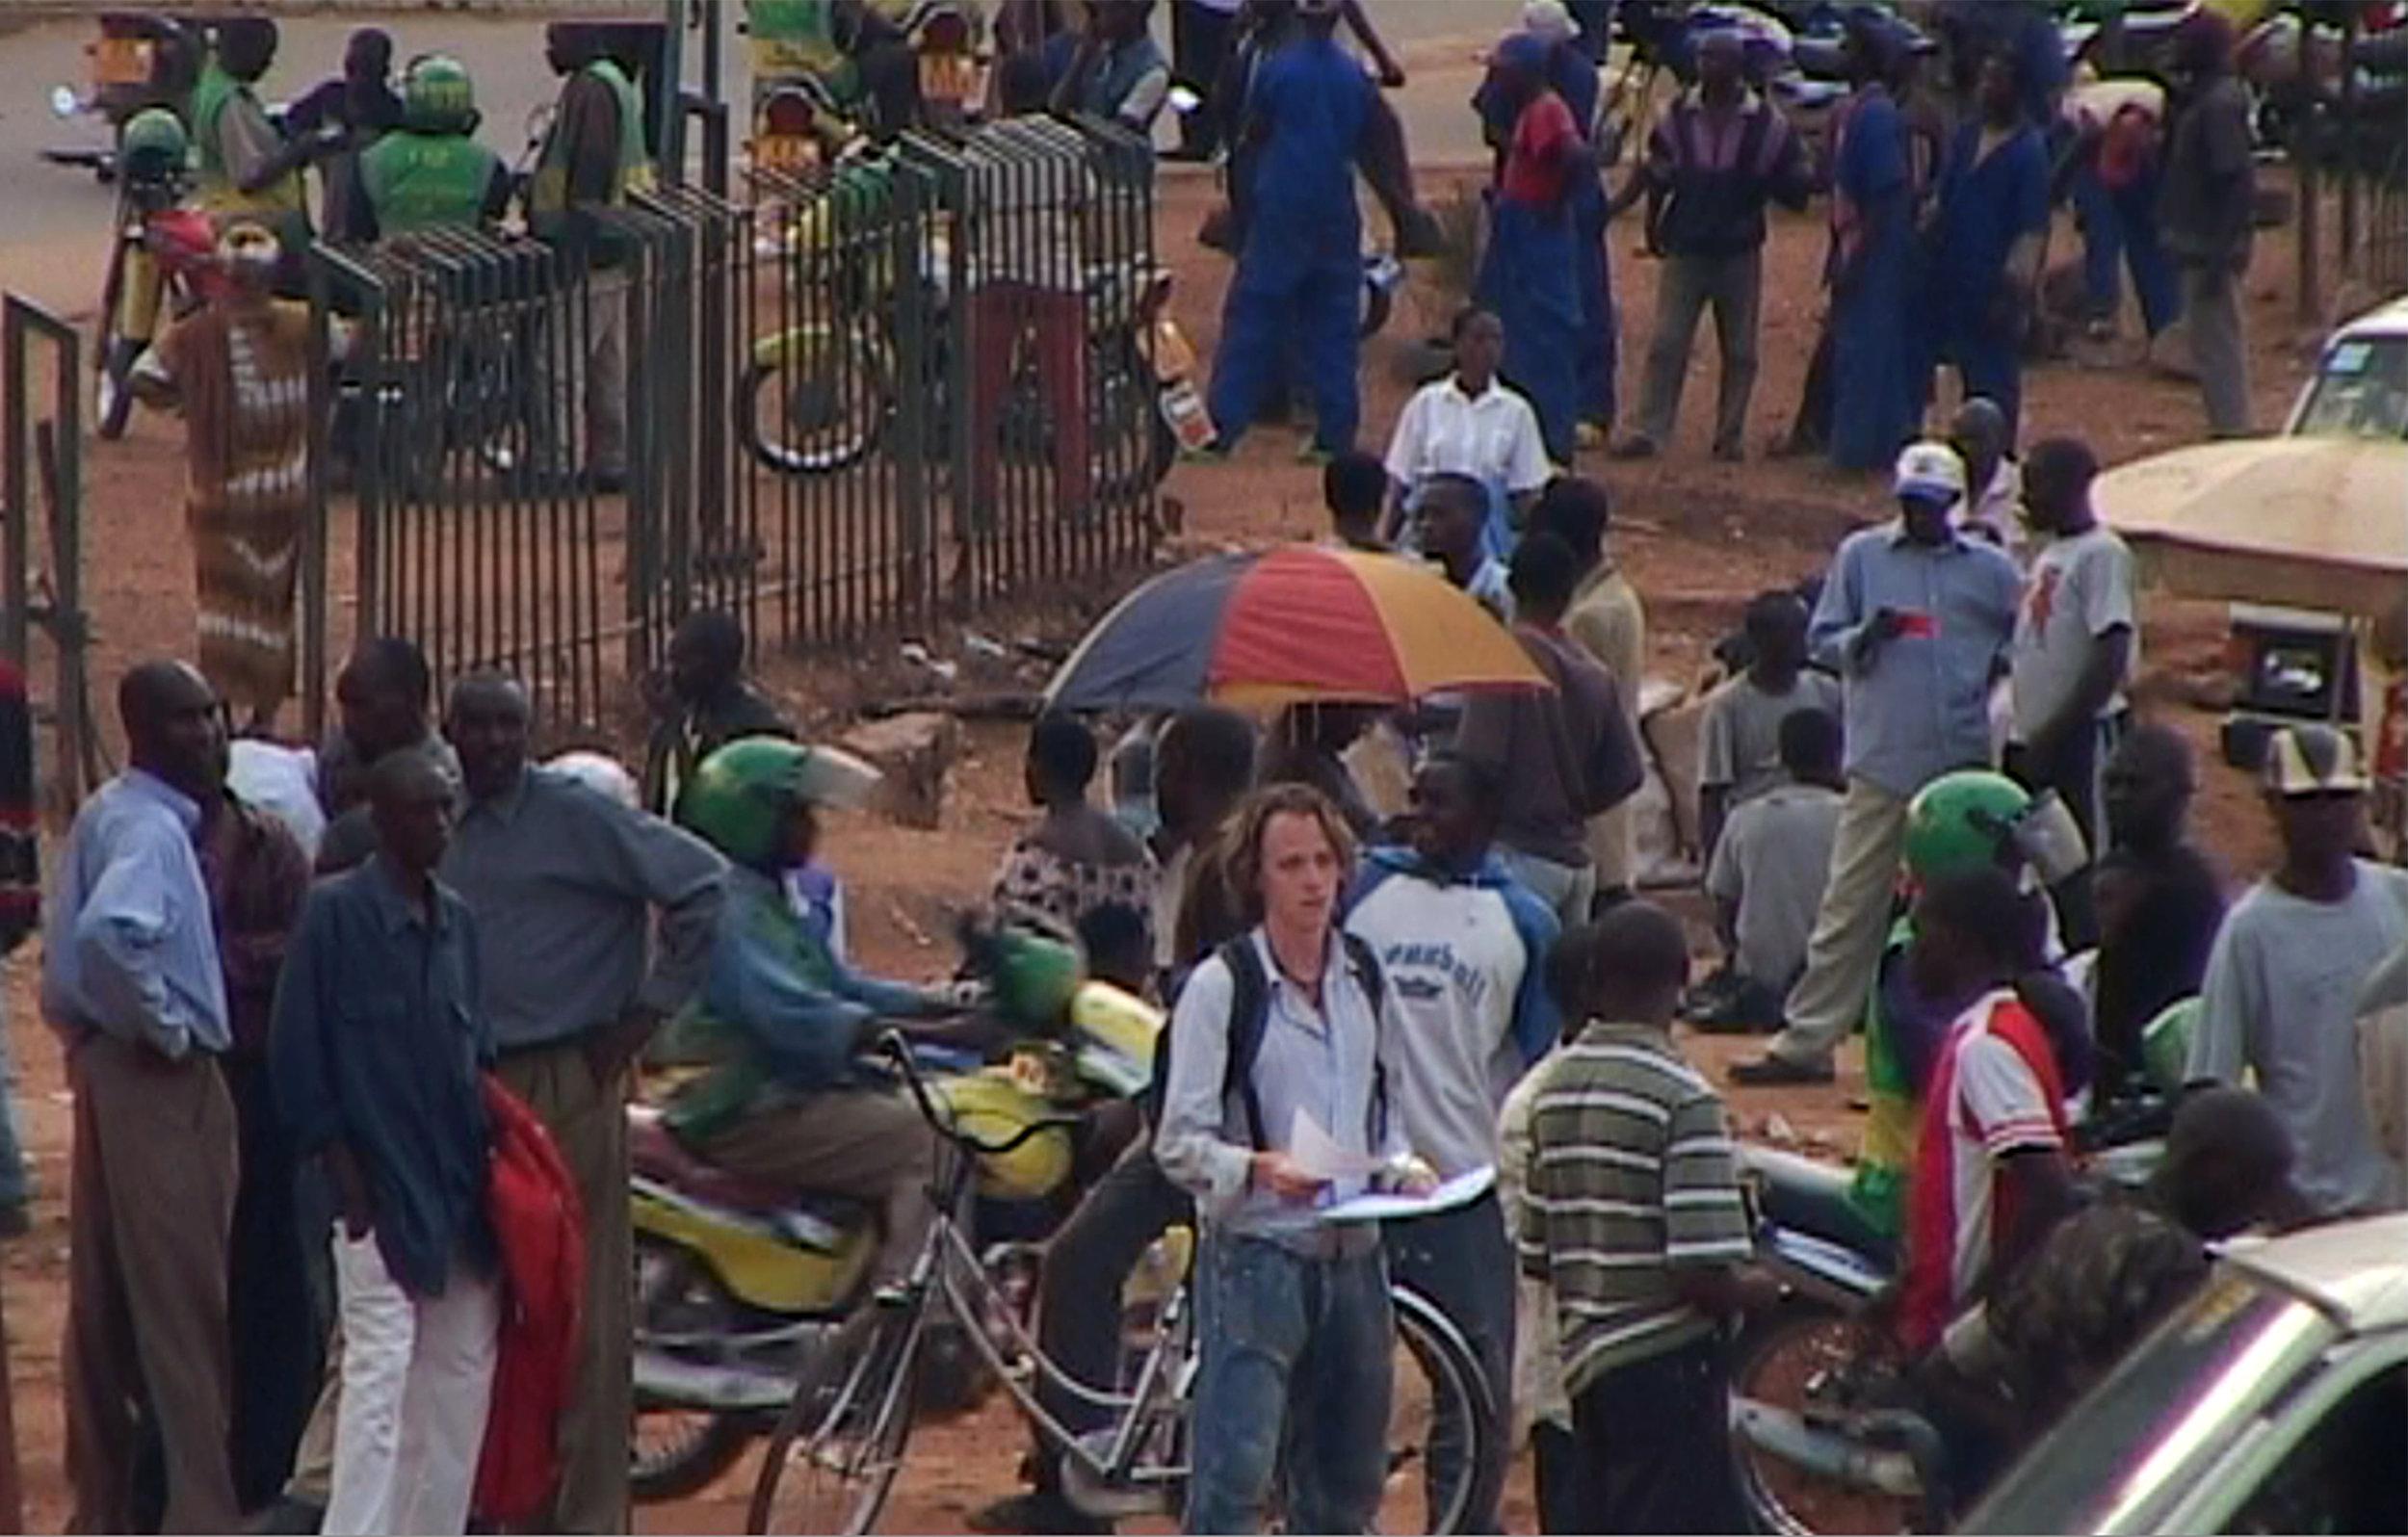 Sven Pannell at a loss in Rwanda